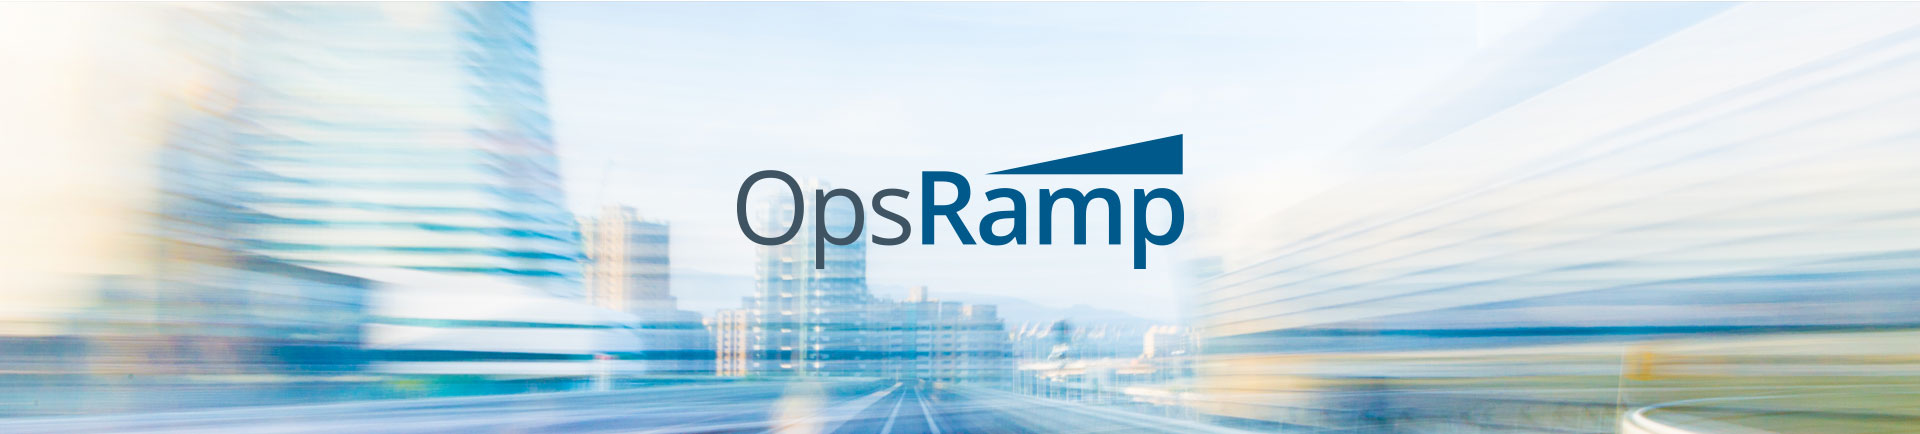 OpsRamp-banner